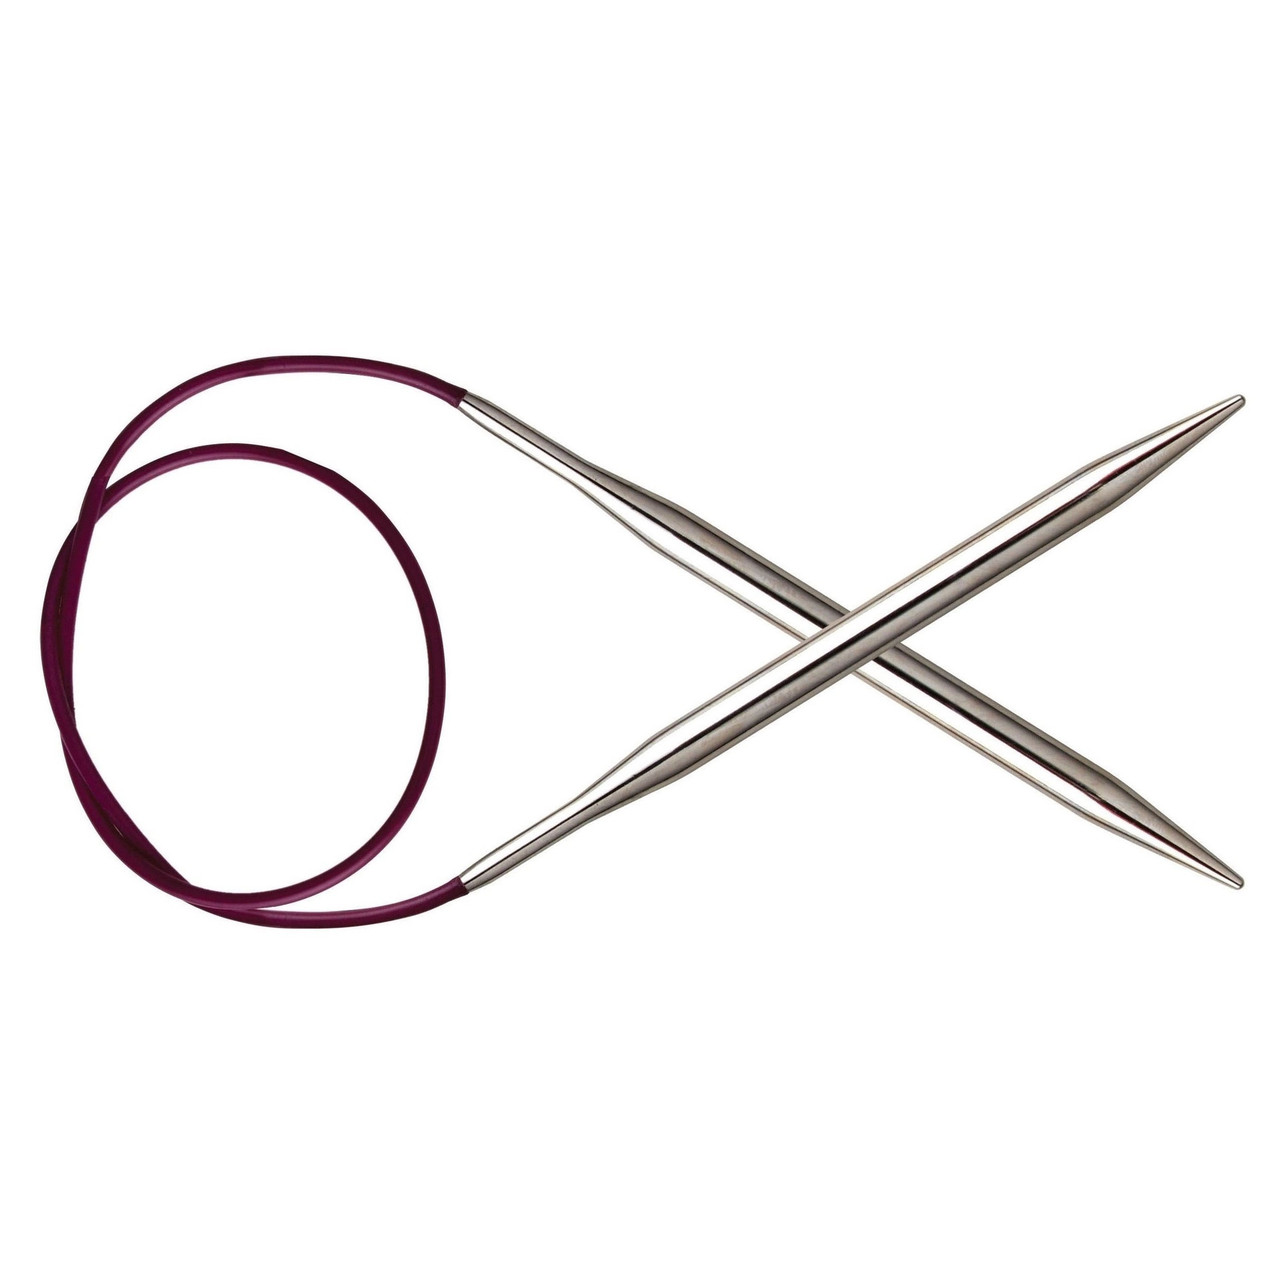 Knit Pro Nova Circular Knitting Needles 3.25mm 80cm